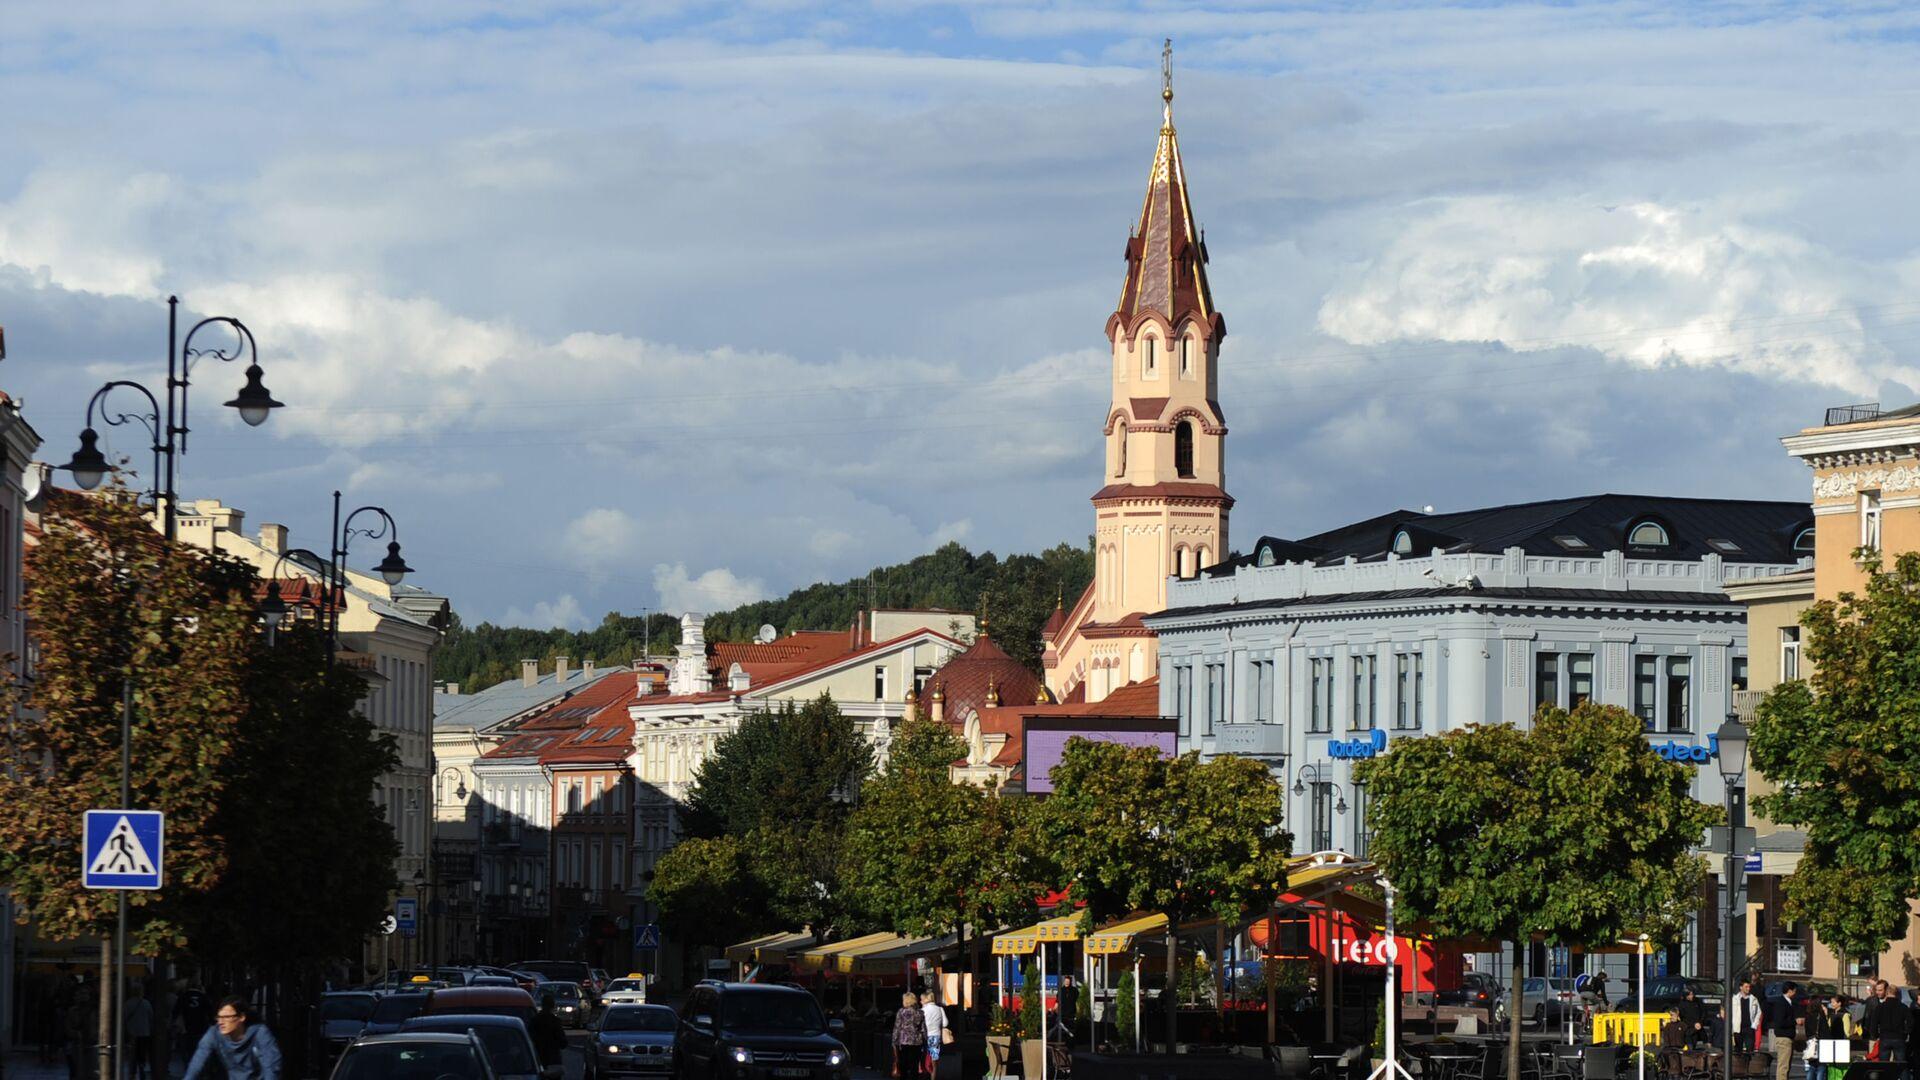 Vilnius - Sputnik Česká republika, 1920, 07.09.2021